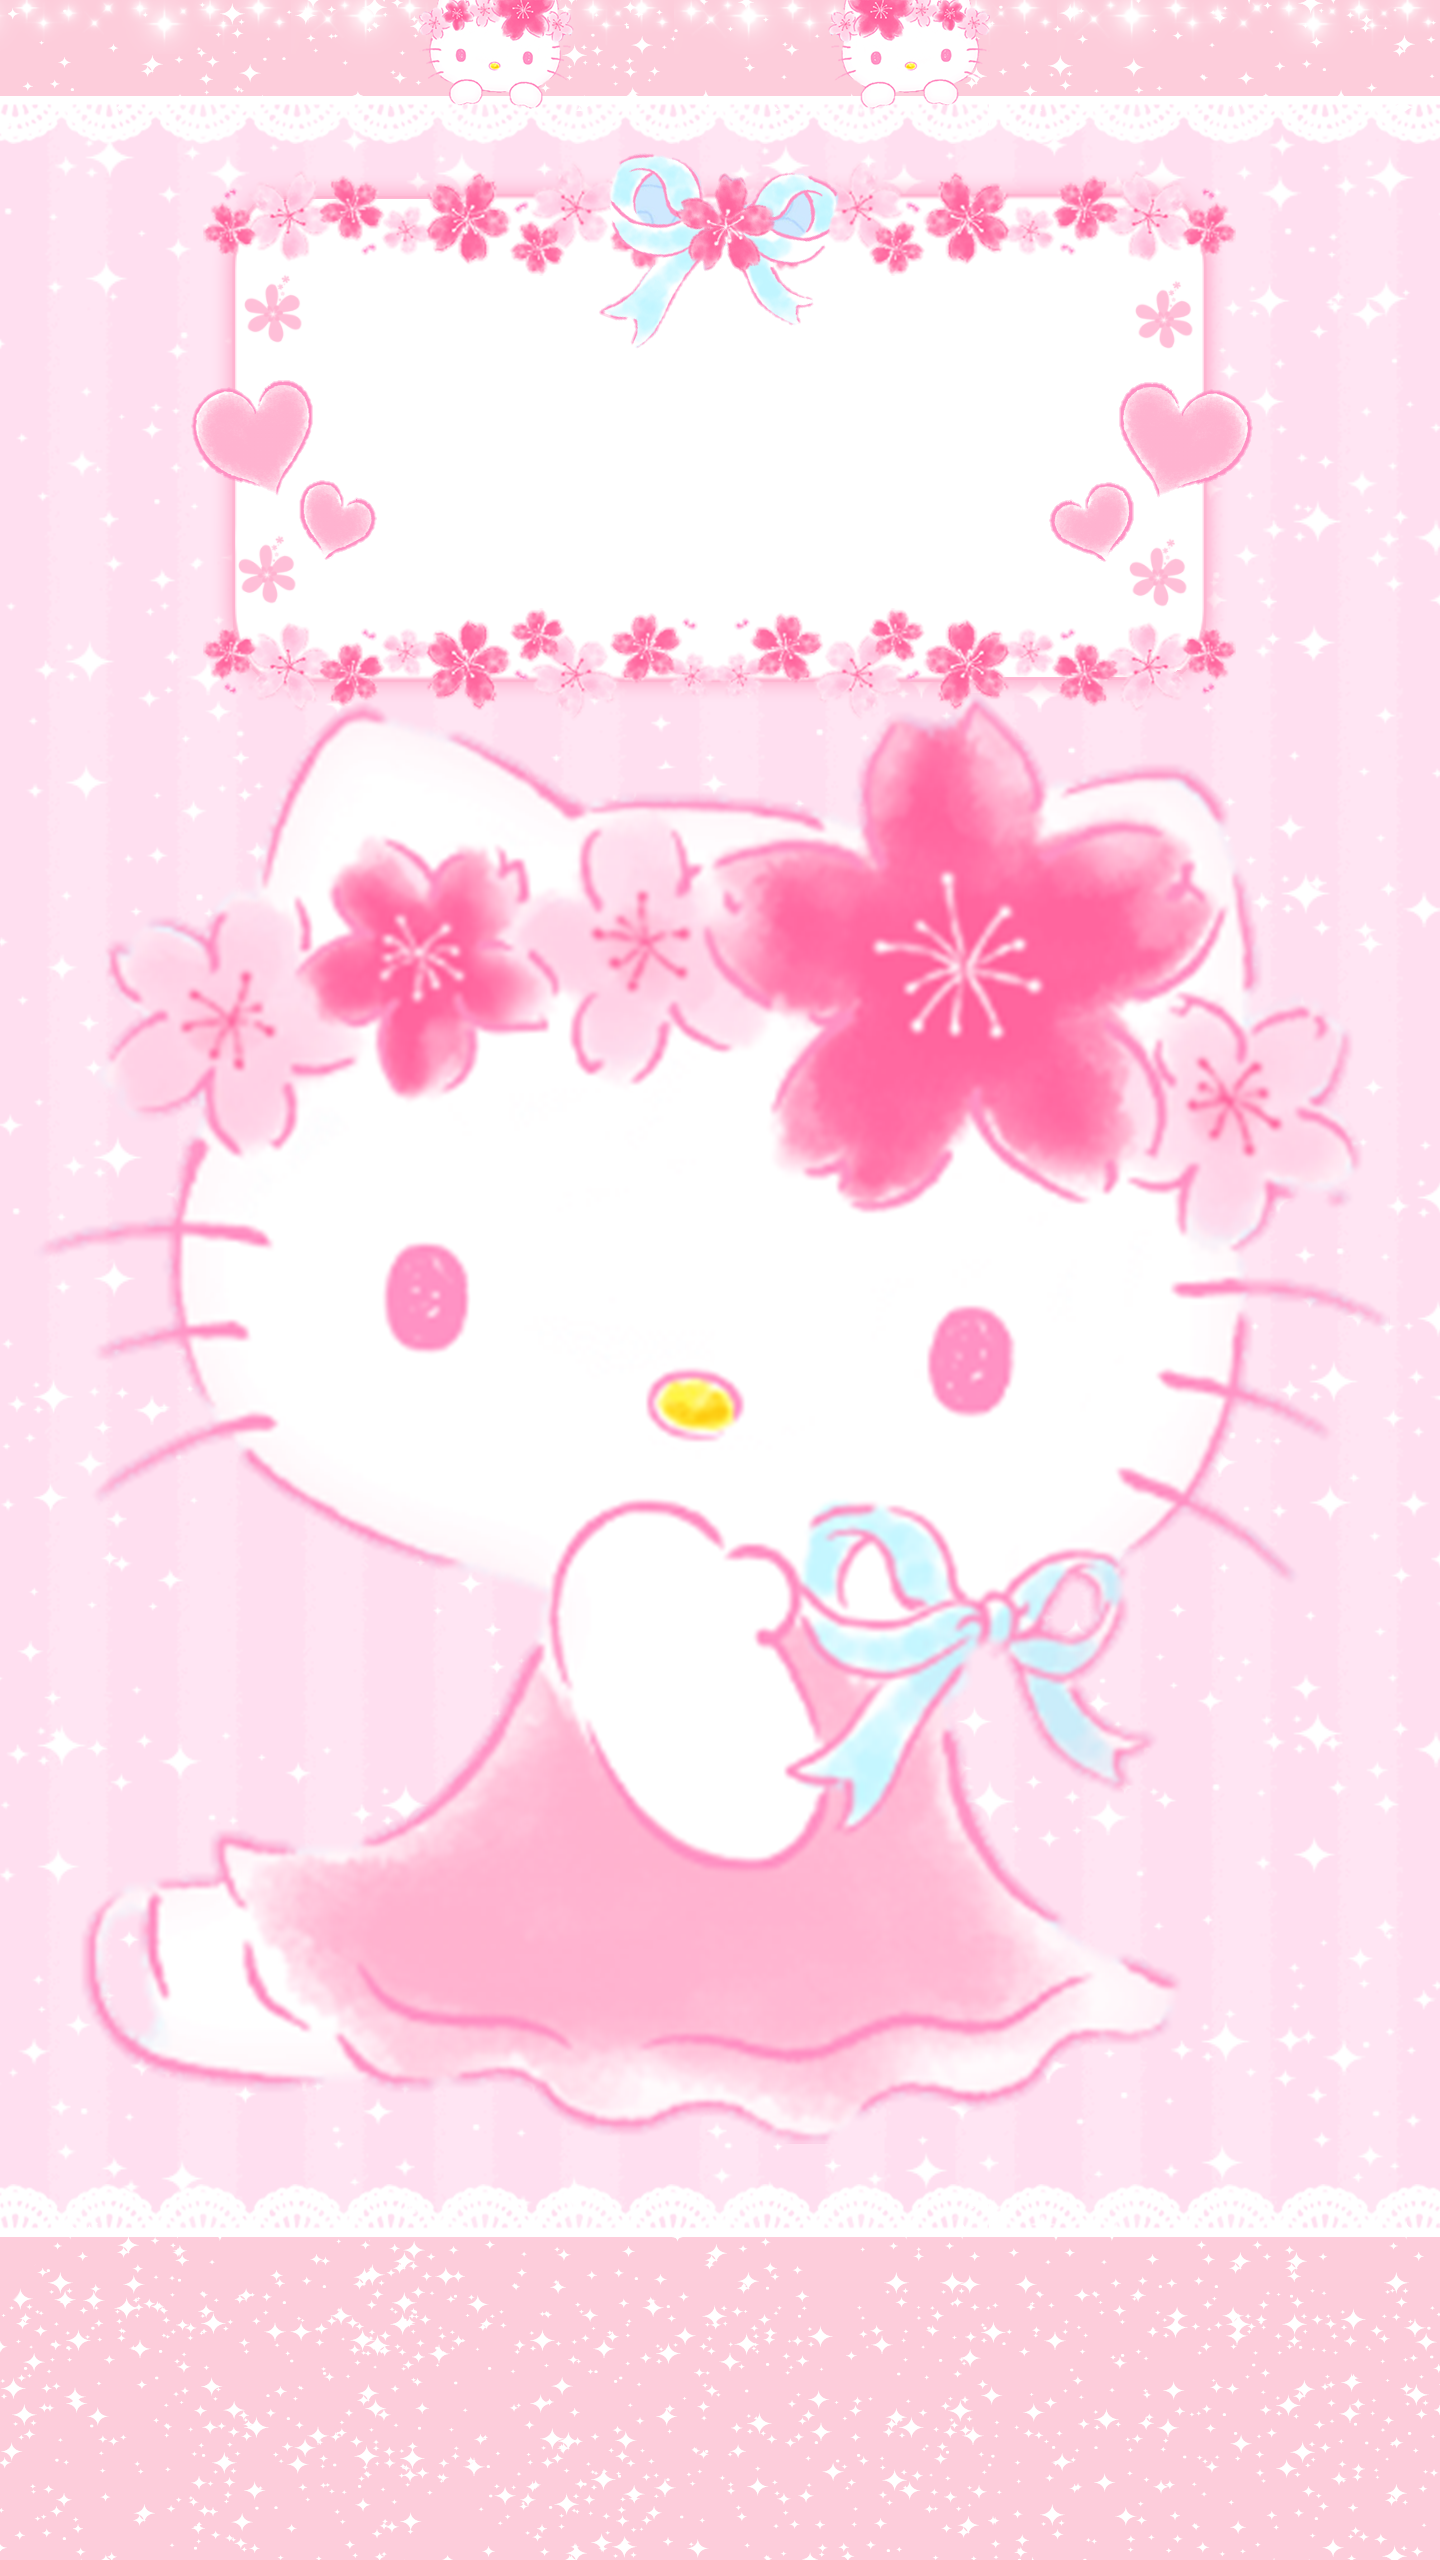 Download Wallpaper Hello Kitty Sakura - 0ee5836444db33b437427500a0391f44  Snapshot_906418.png